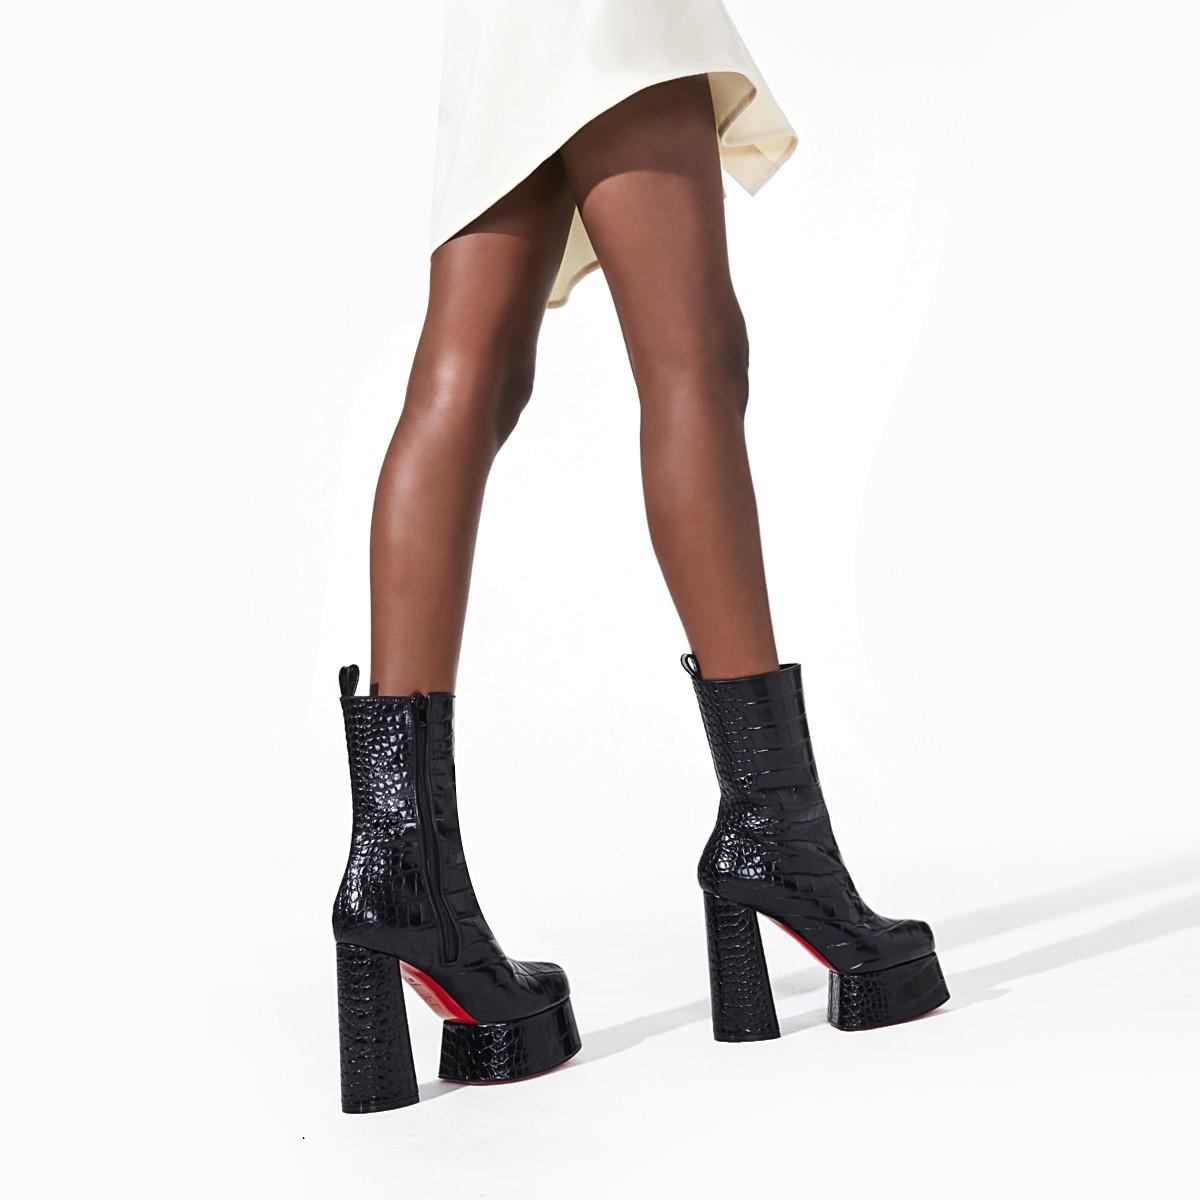 Shoes - Izamayeah - Christian Louboutin